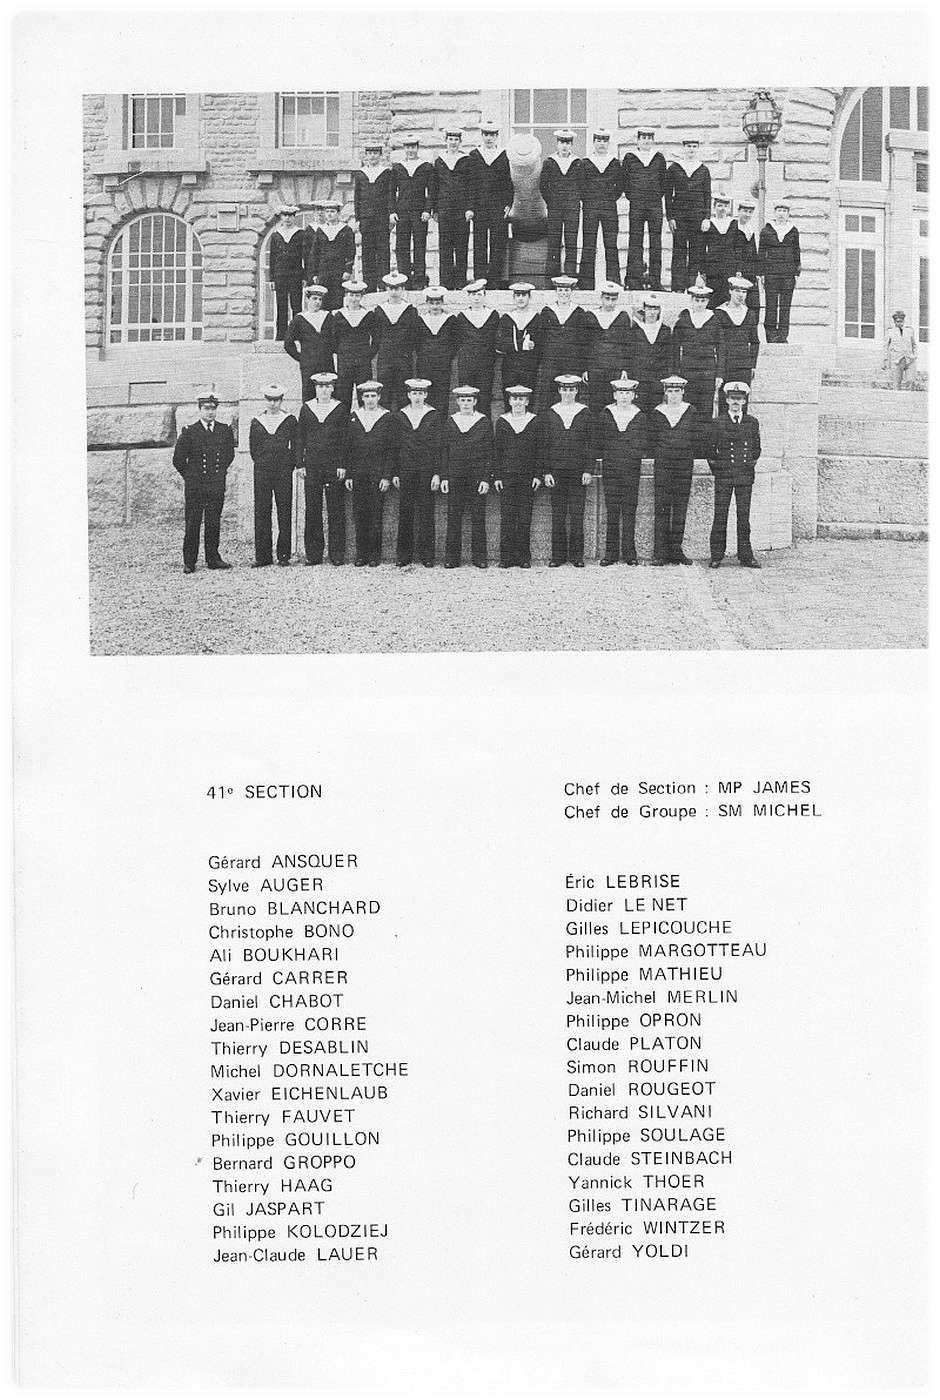 [ École des Mousses ] École des mousses 76/77 Mousse10